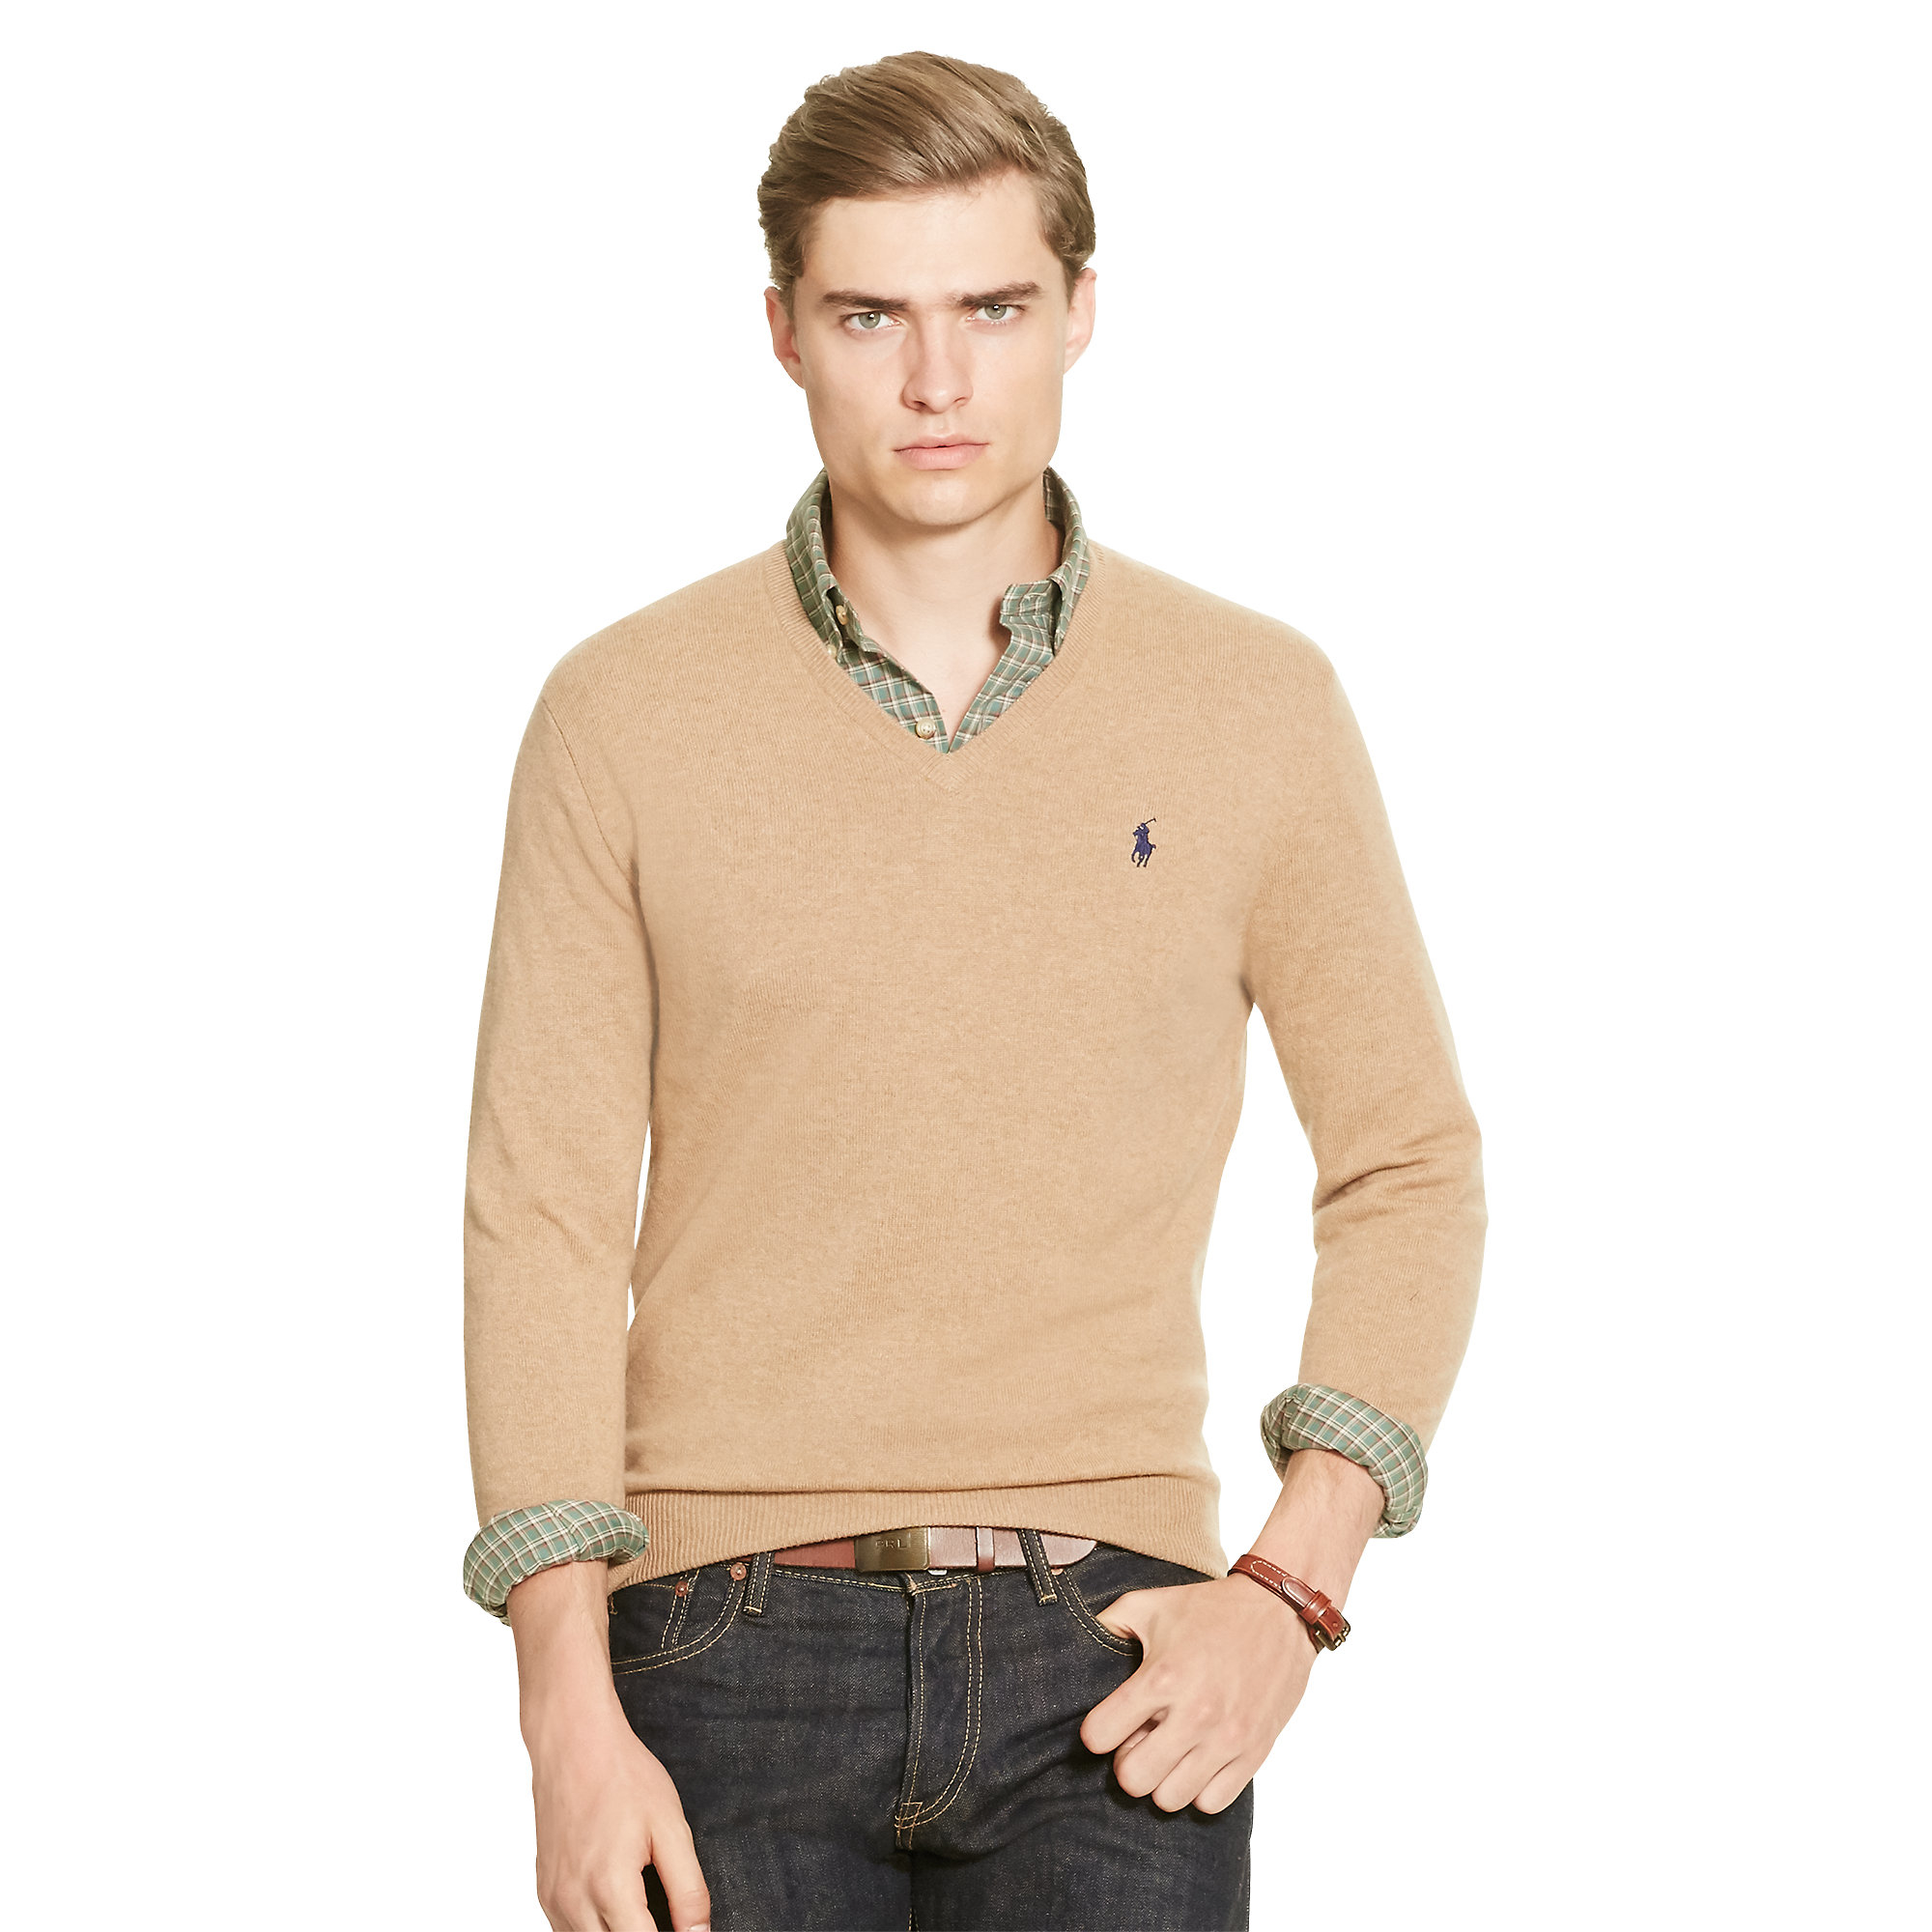 lyst polo ralph lauren merino wool v neck sweater in natural for men. Black Bedroom Furniture Sets. Home Design Ideas